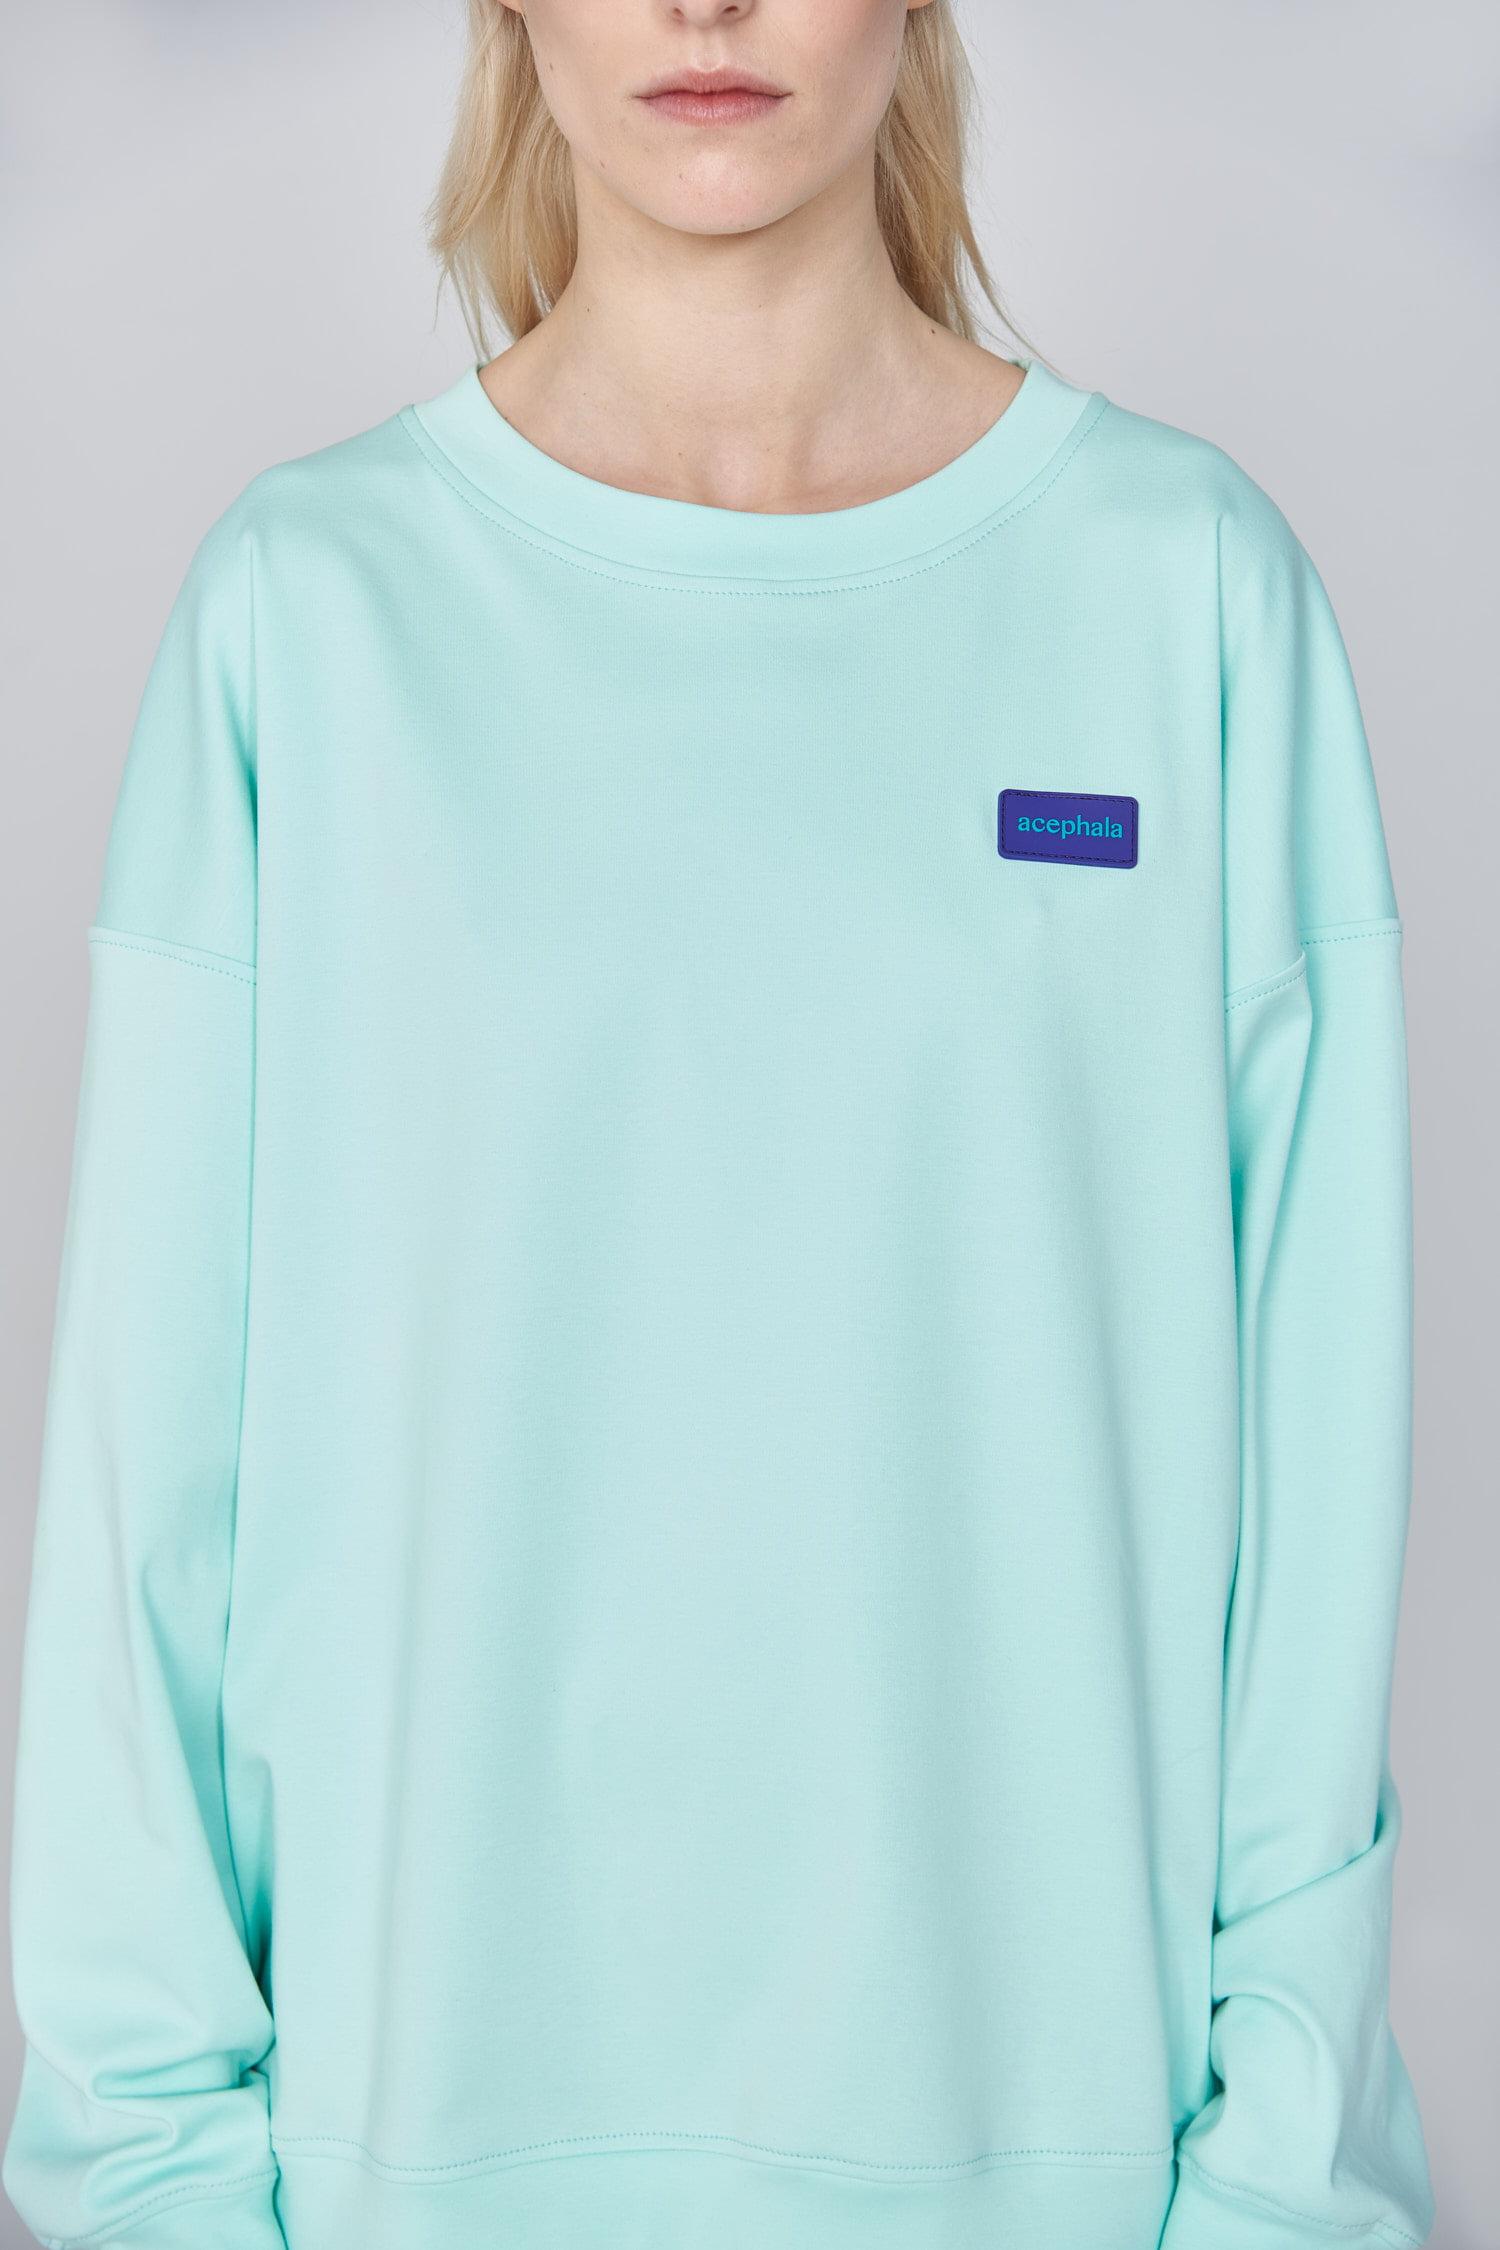 Acephala Ss21 Unisex Mint Sweatshirt Detail